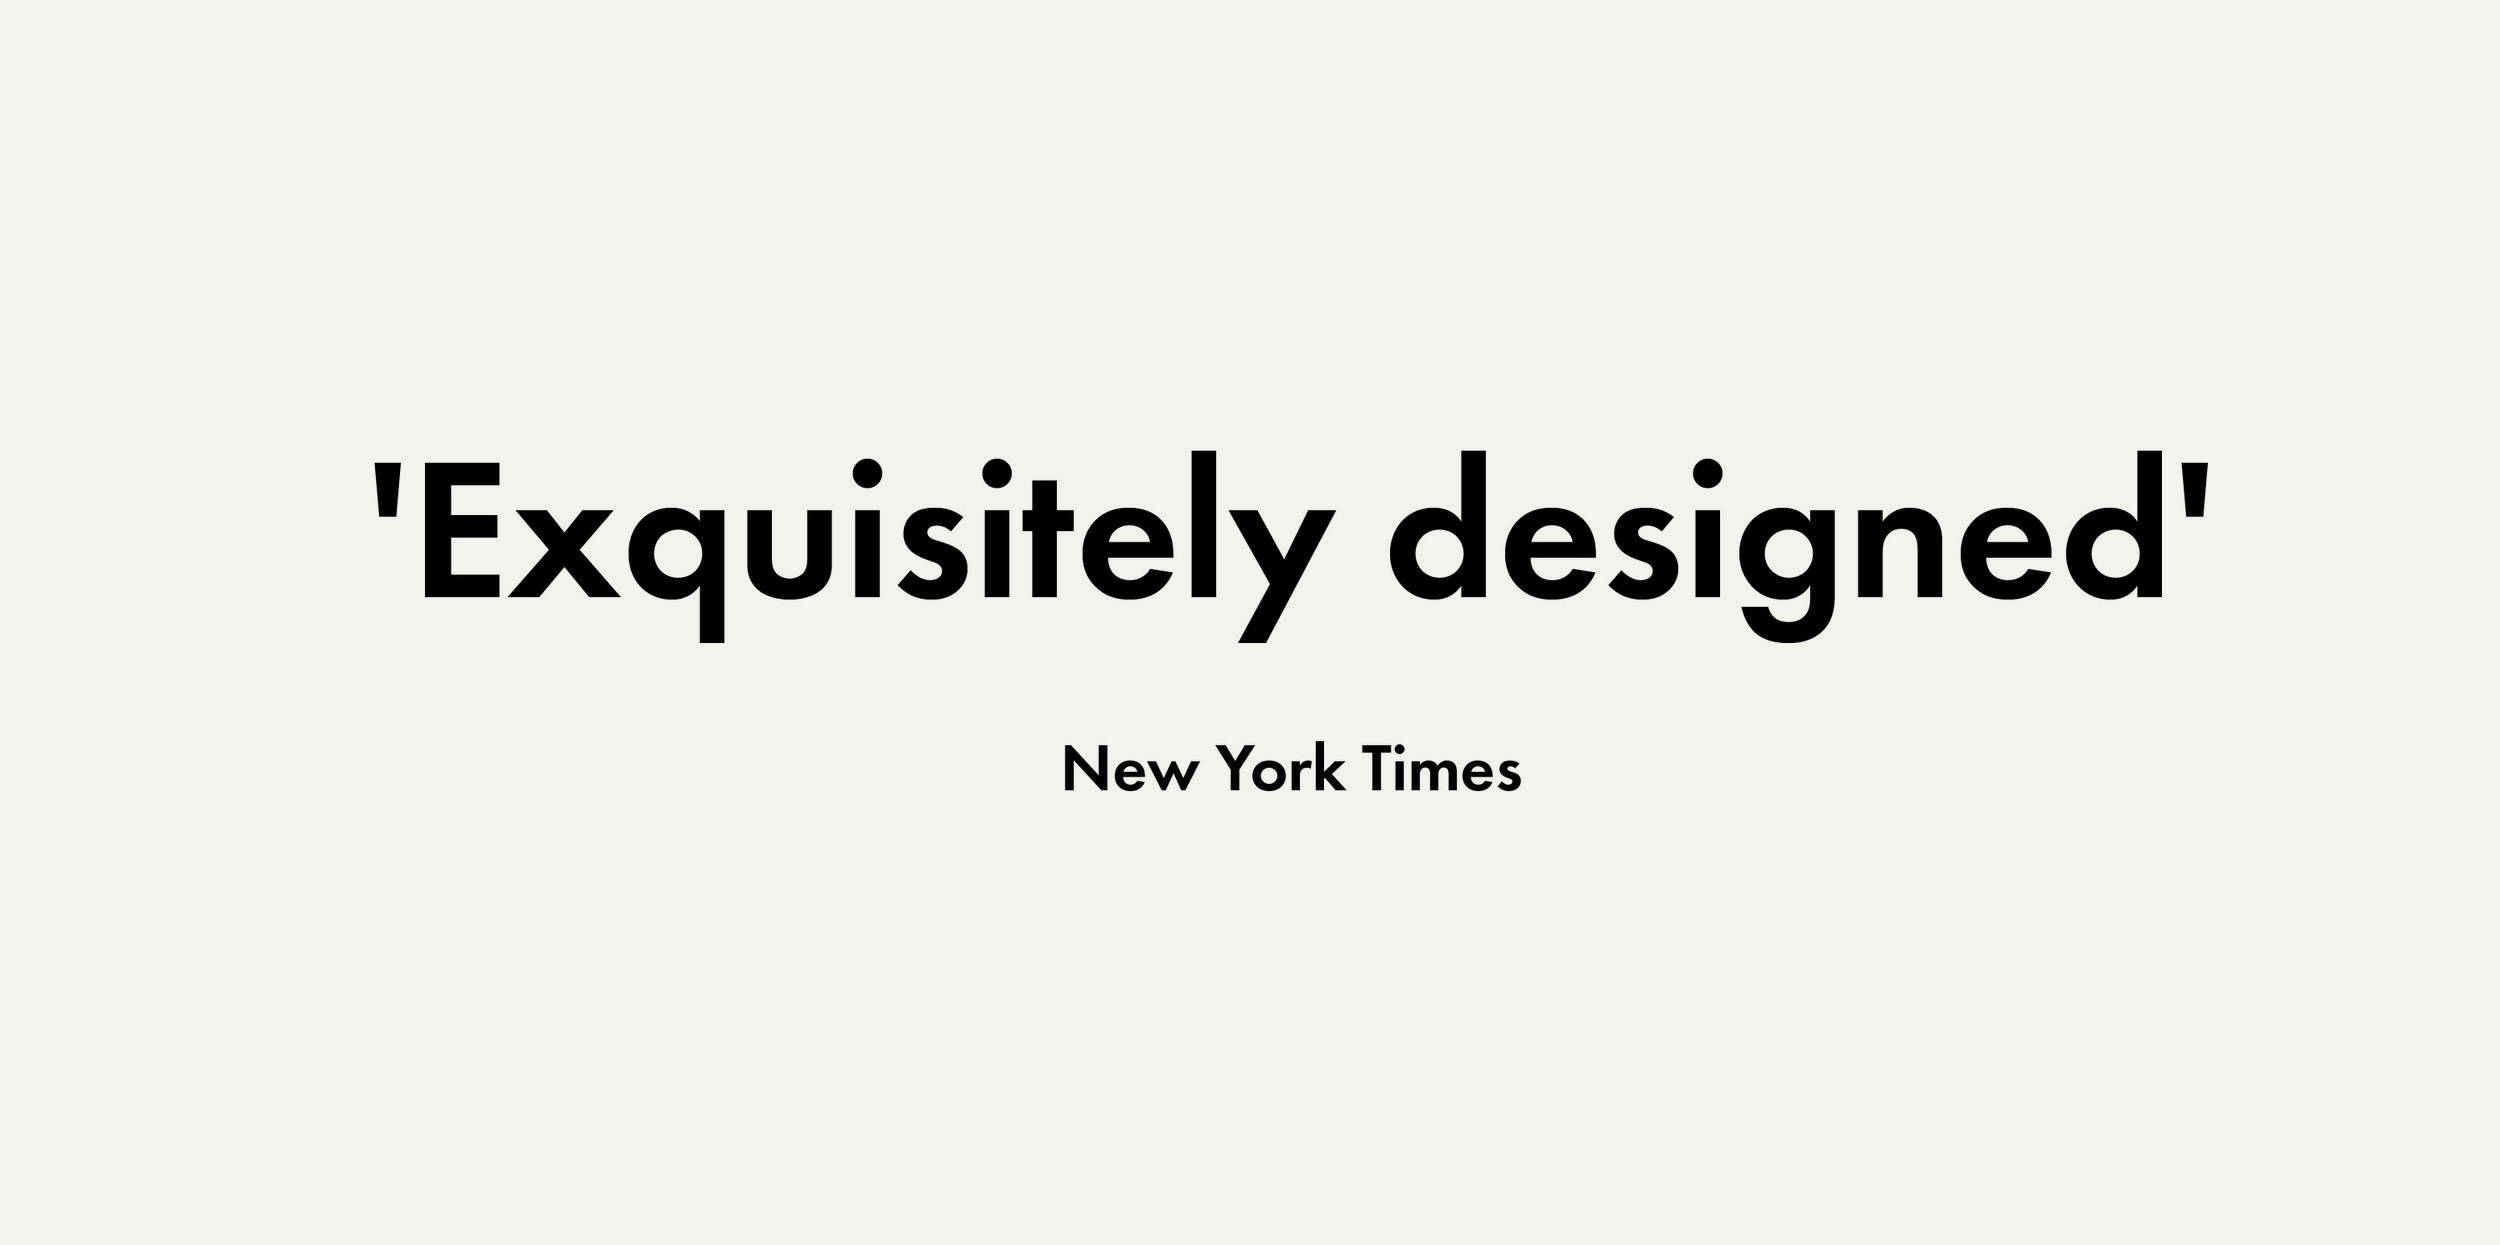 NYT_banner_text_130319.jpg